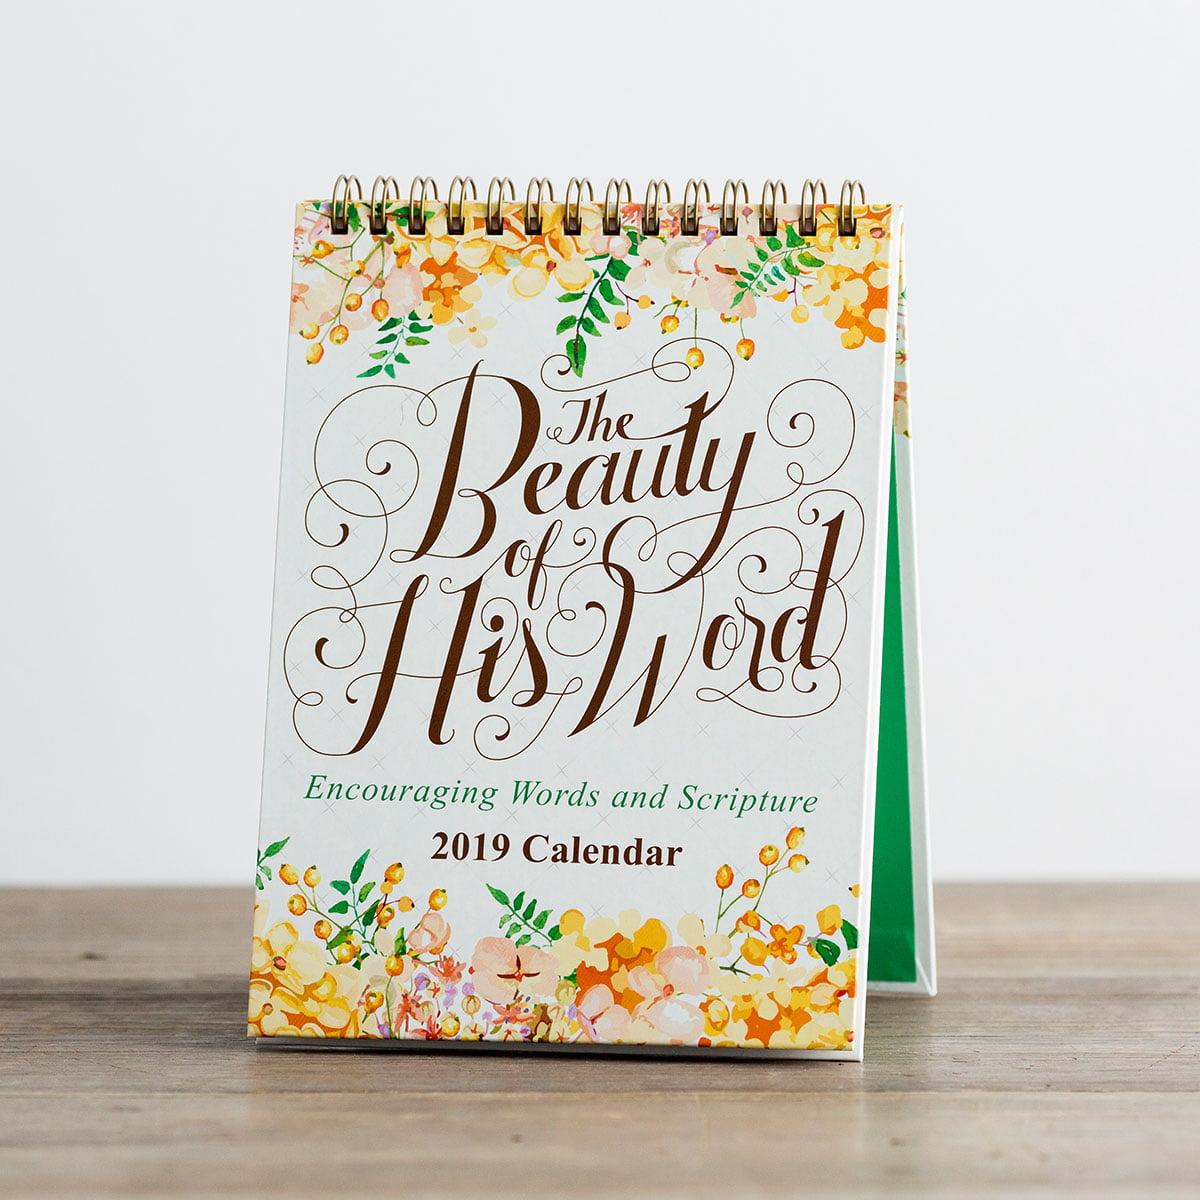 DaySpring  -  DaySpring - The Beauty of His Word - 2019 Desktop Calendar